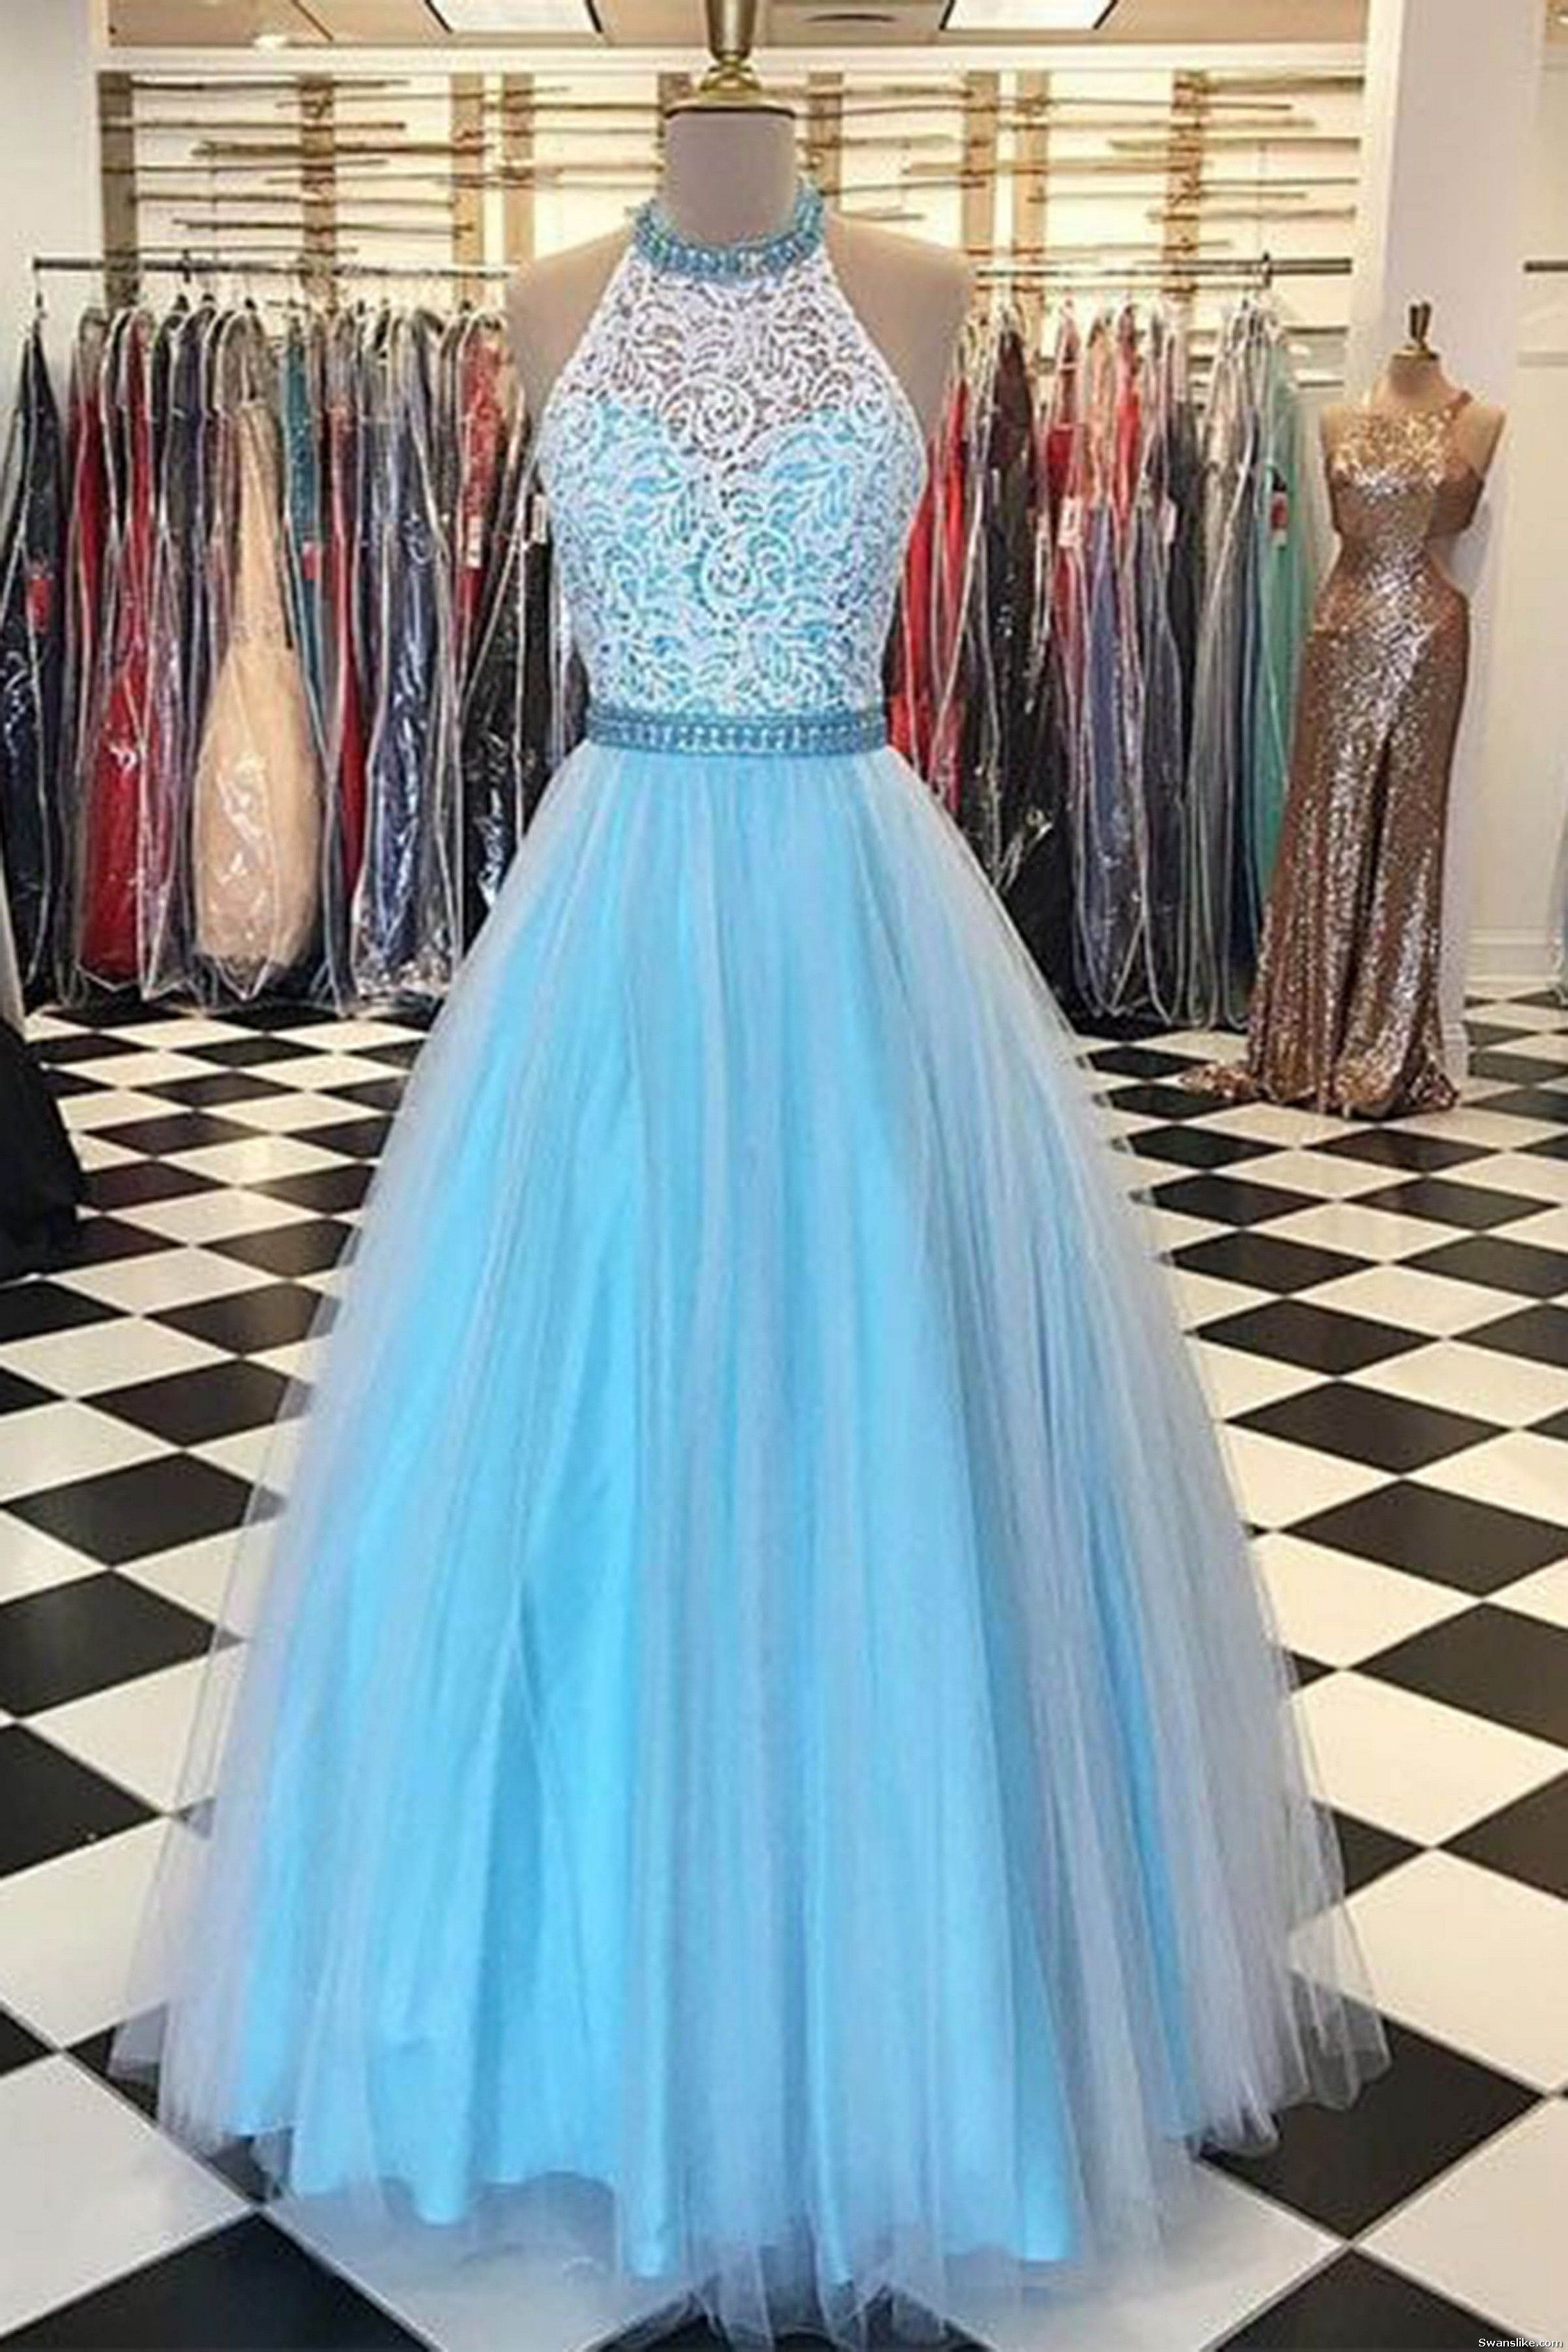 Fashionable Dresses Evening Dresses 2018 Long sleeve Prom Dresses ...